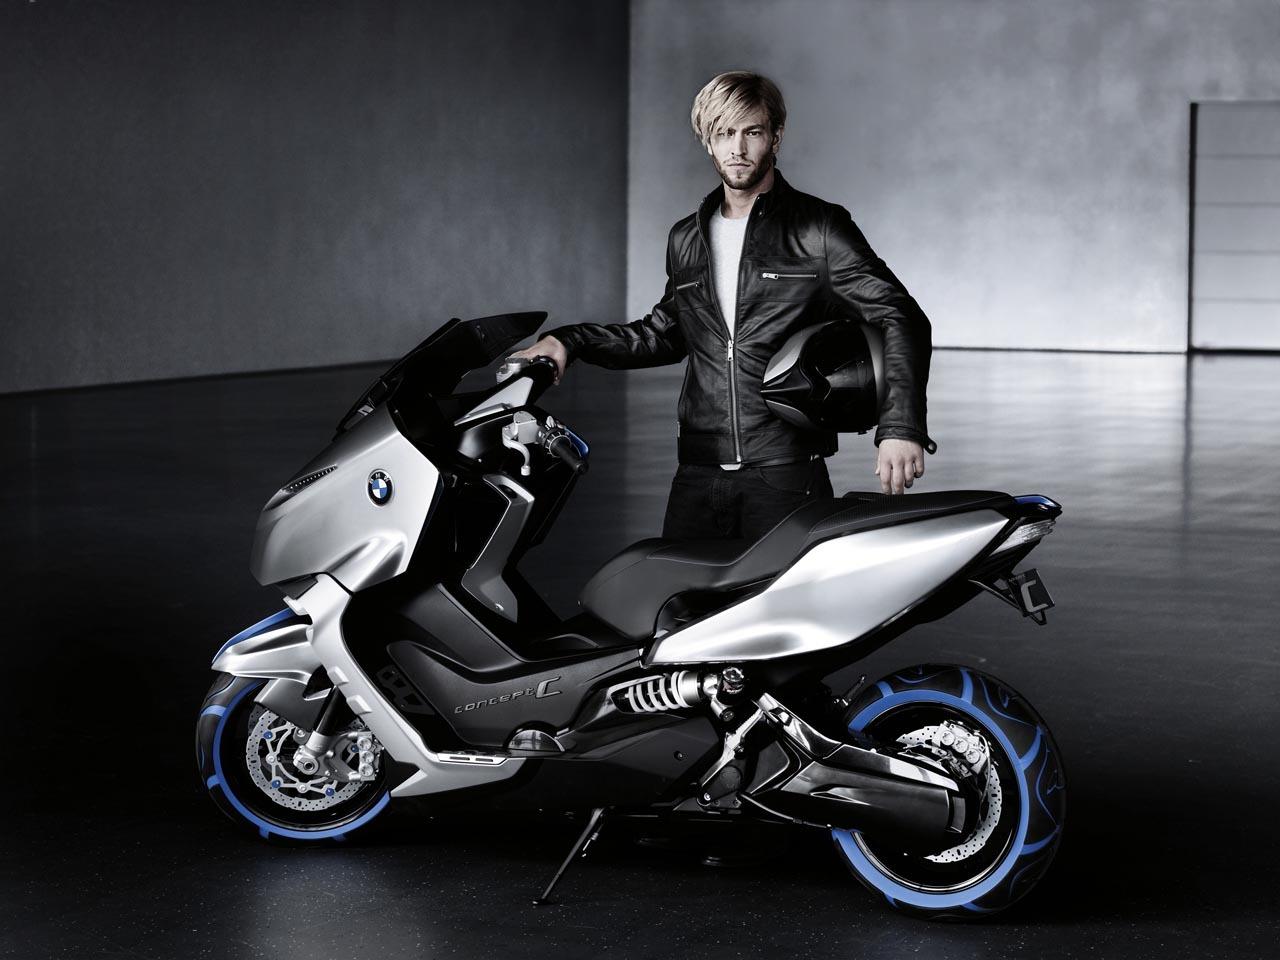 Foto de BMW Concept C Scooter, el Scooter del futuro según BMW (12/19)